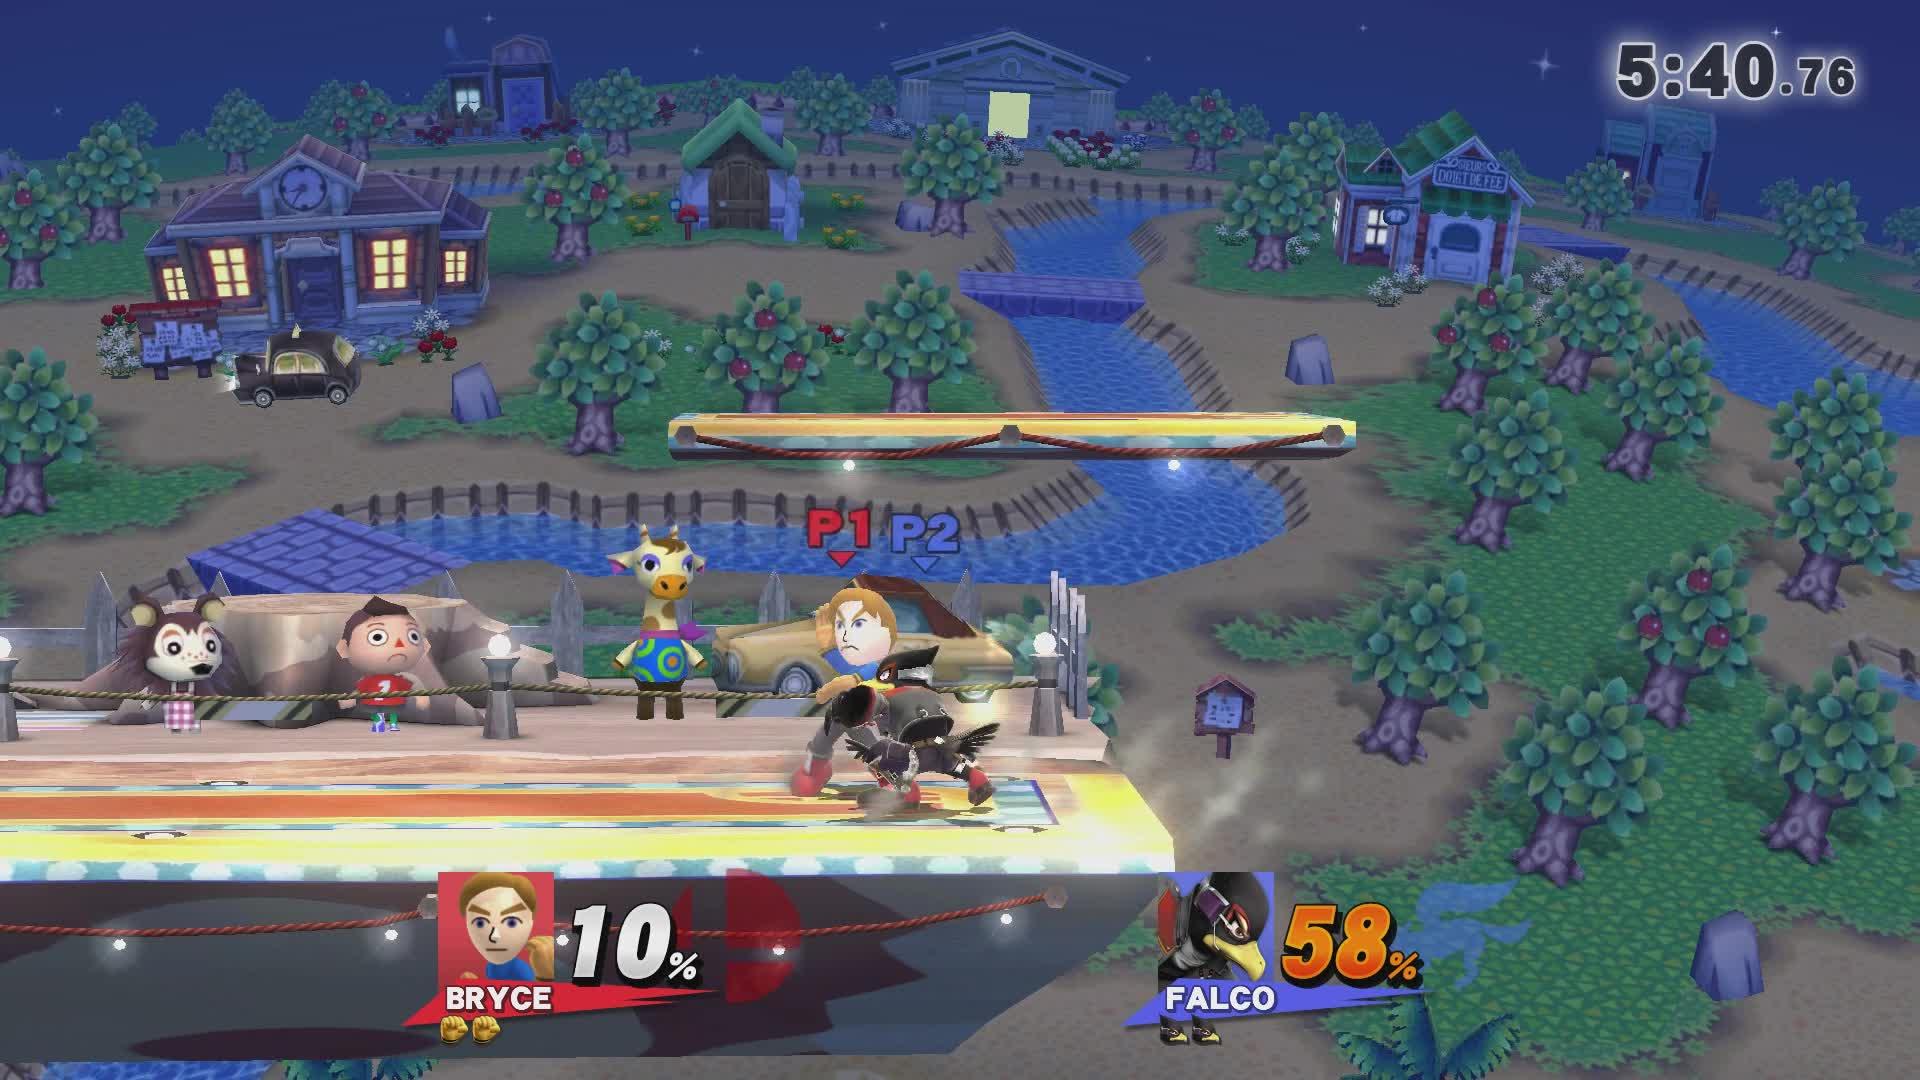 smashgifs, Super Smash Bros for Wii U - My Great Capture - 2018-05-08 19-48-02 GIFs